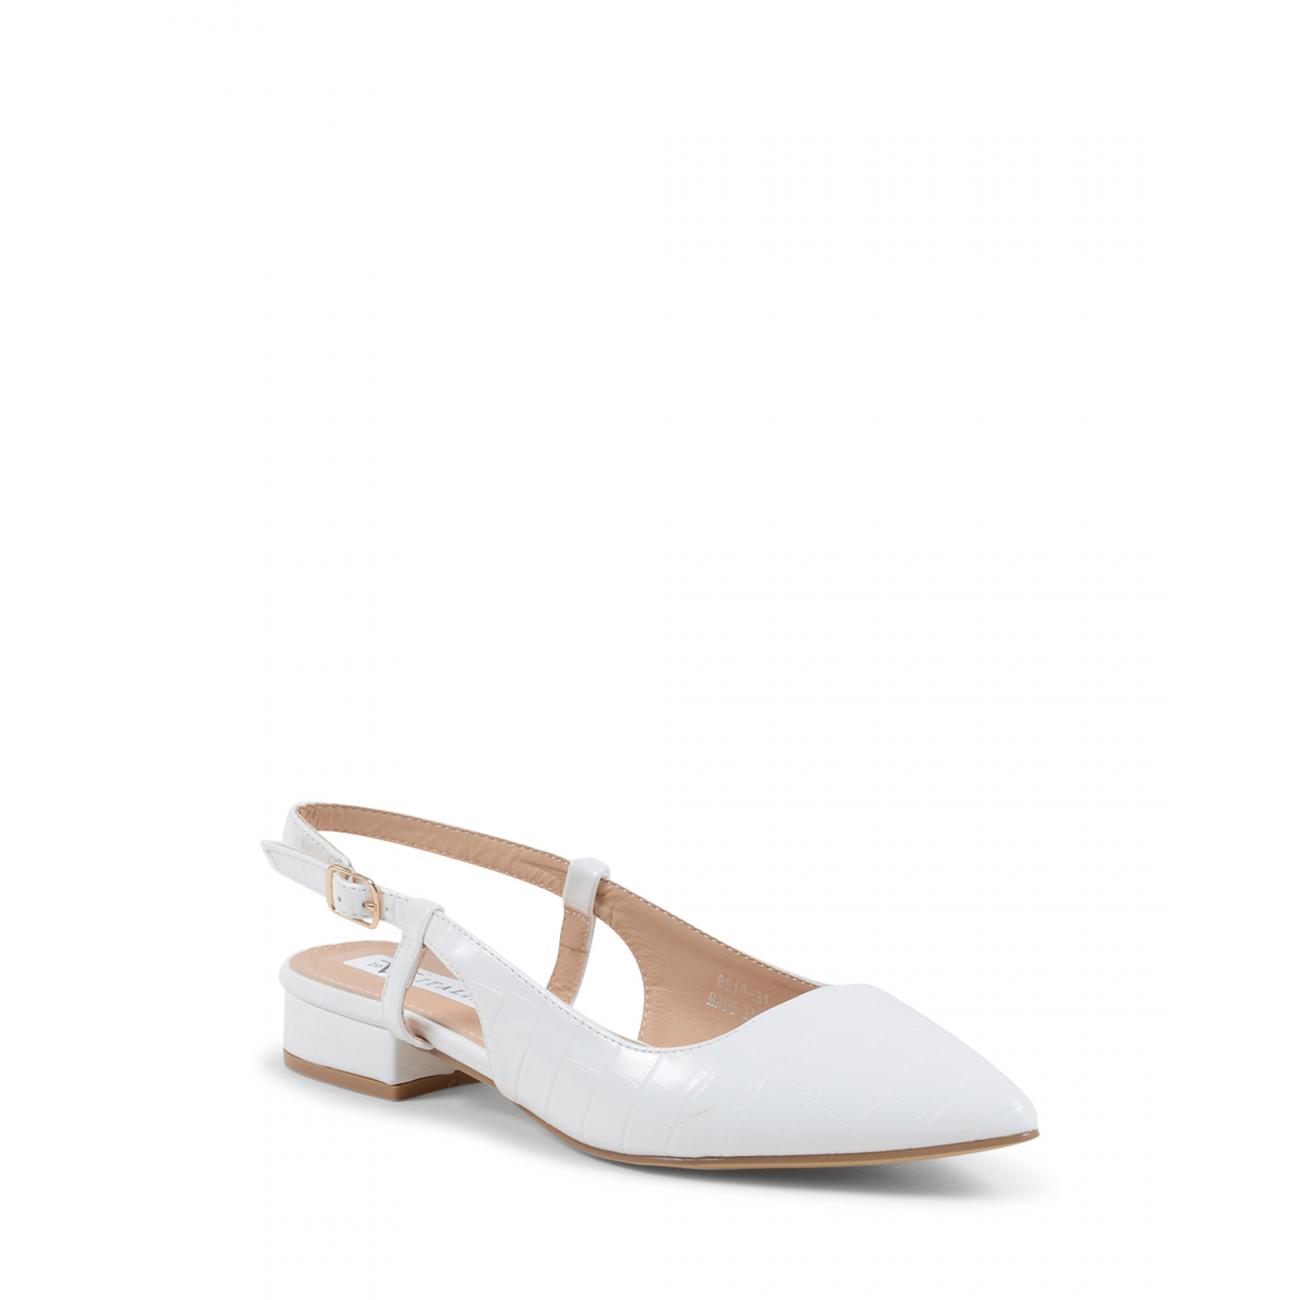 19V69 Italia Women's Slingback Ballerina White V81831 WHITE